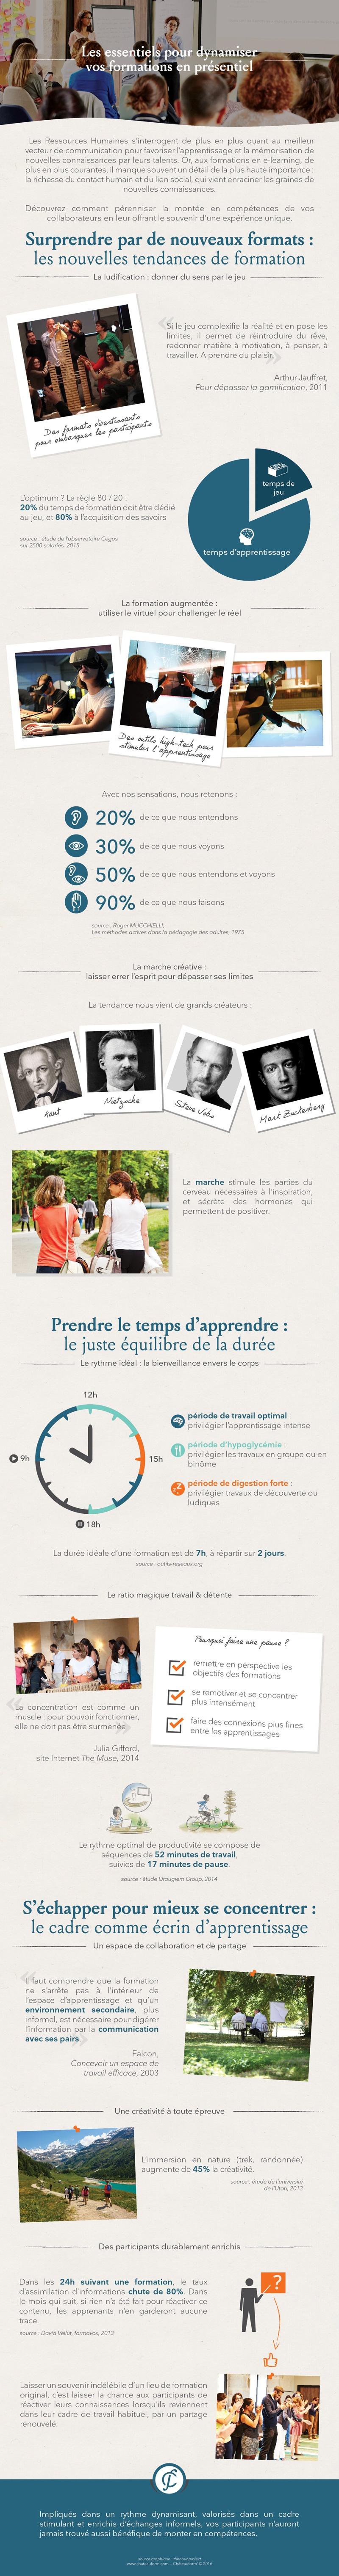 160404_chateauform_infographie_RH_800px